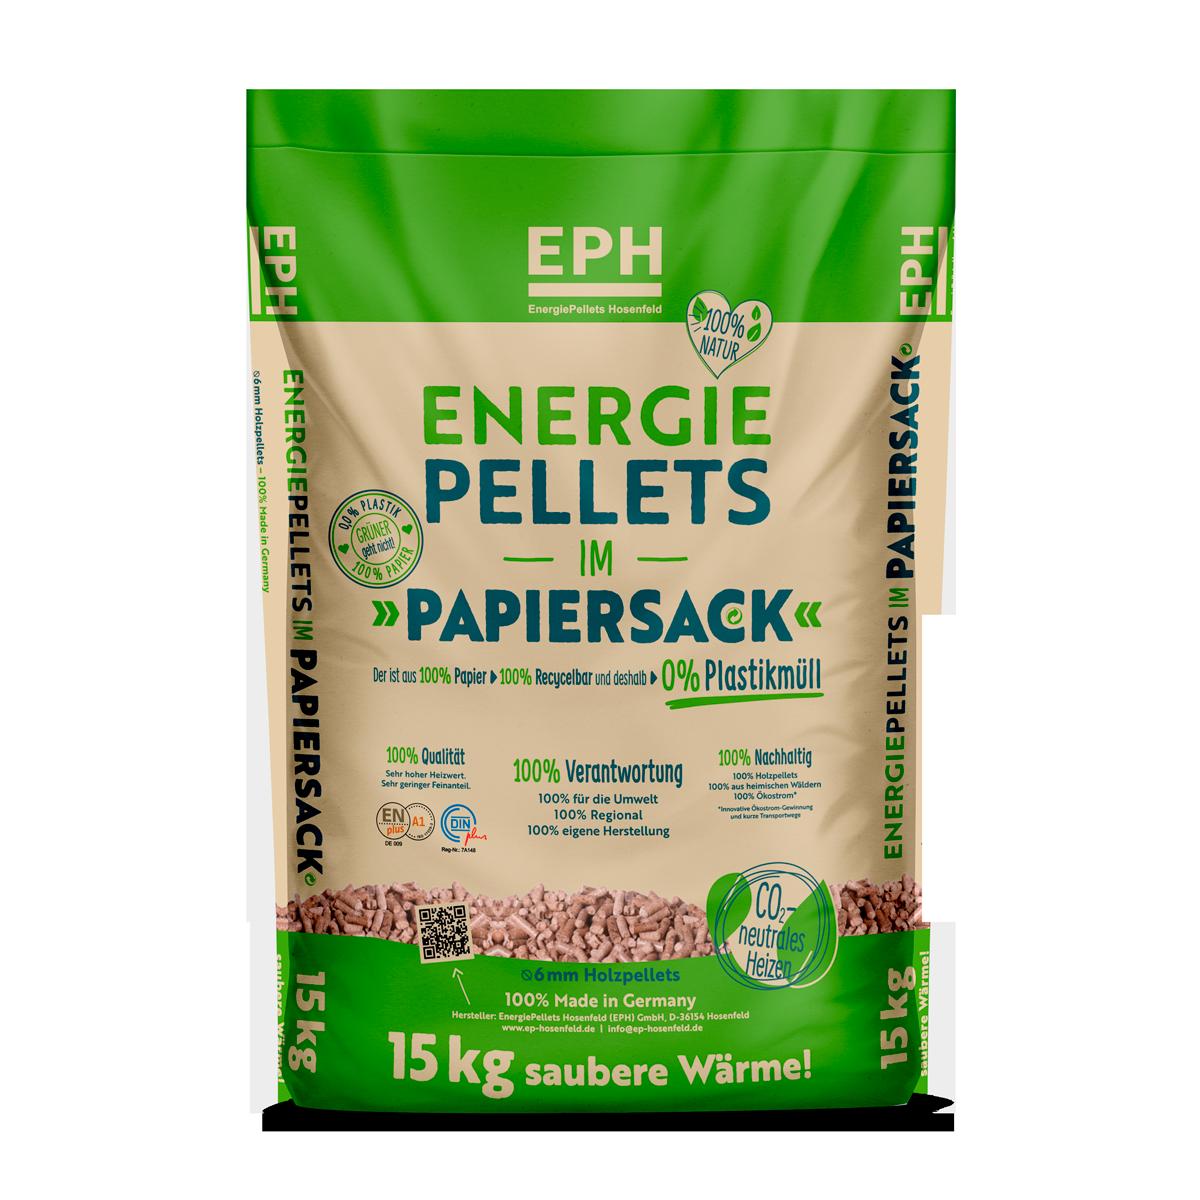 Holzpellets, Energiepellets im Papiersack - EPH